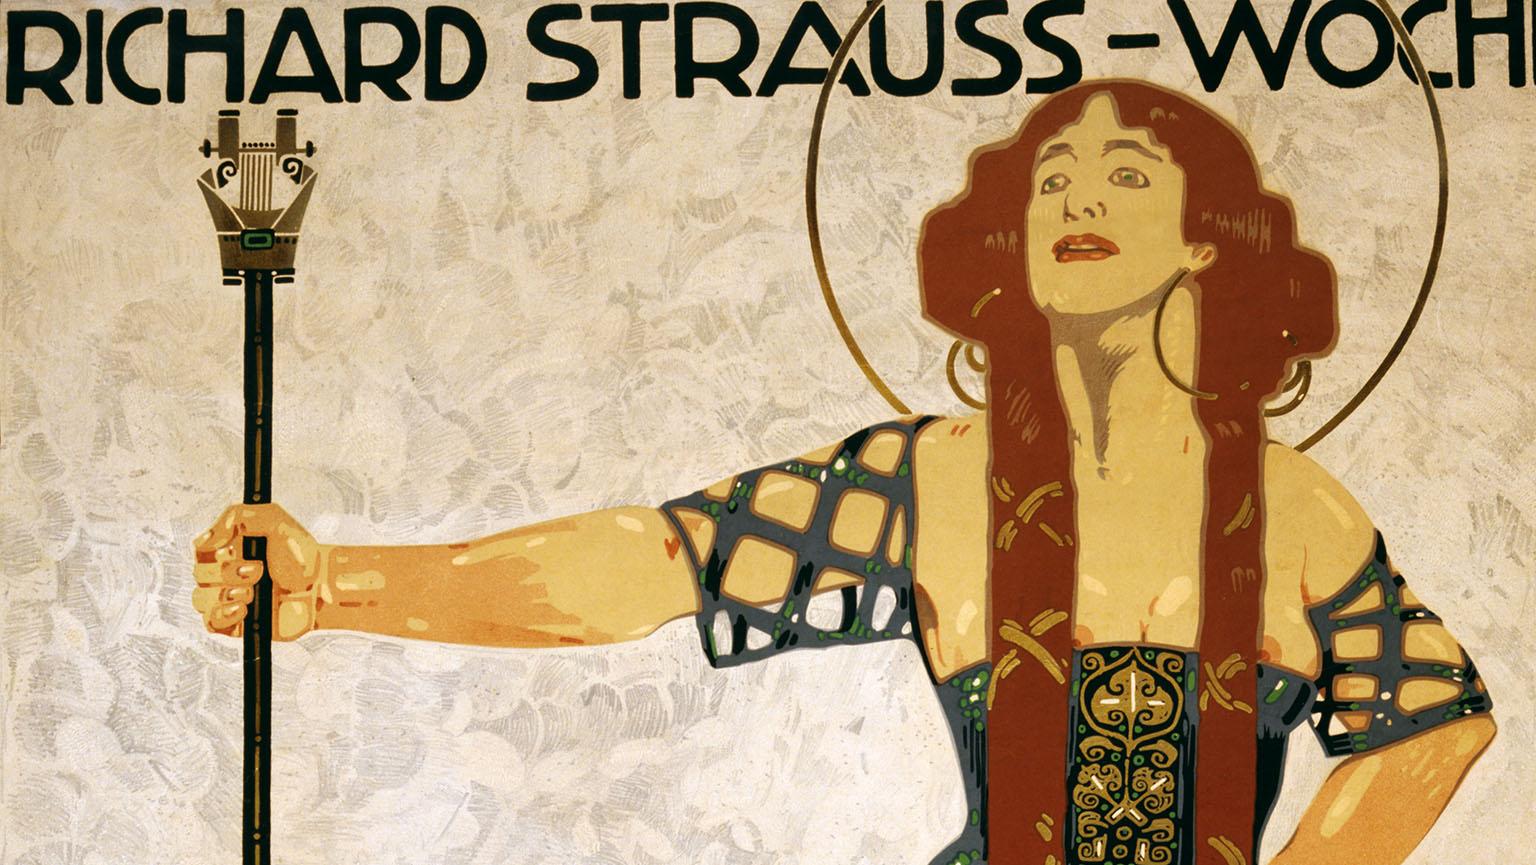 Late Romantic German Opera—Richard Strauss and Salome